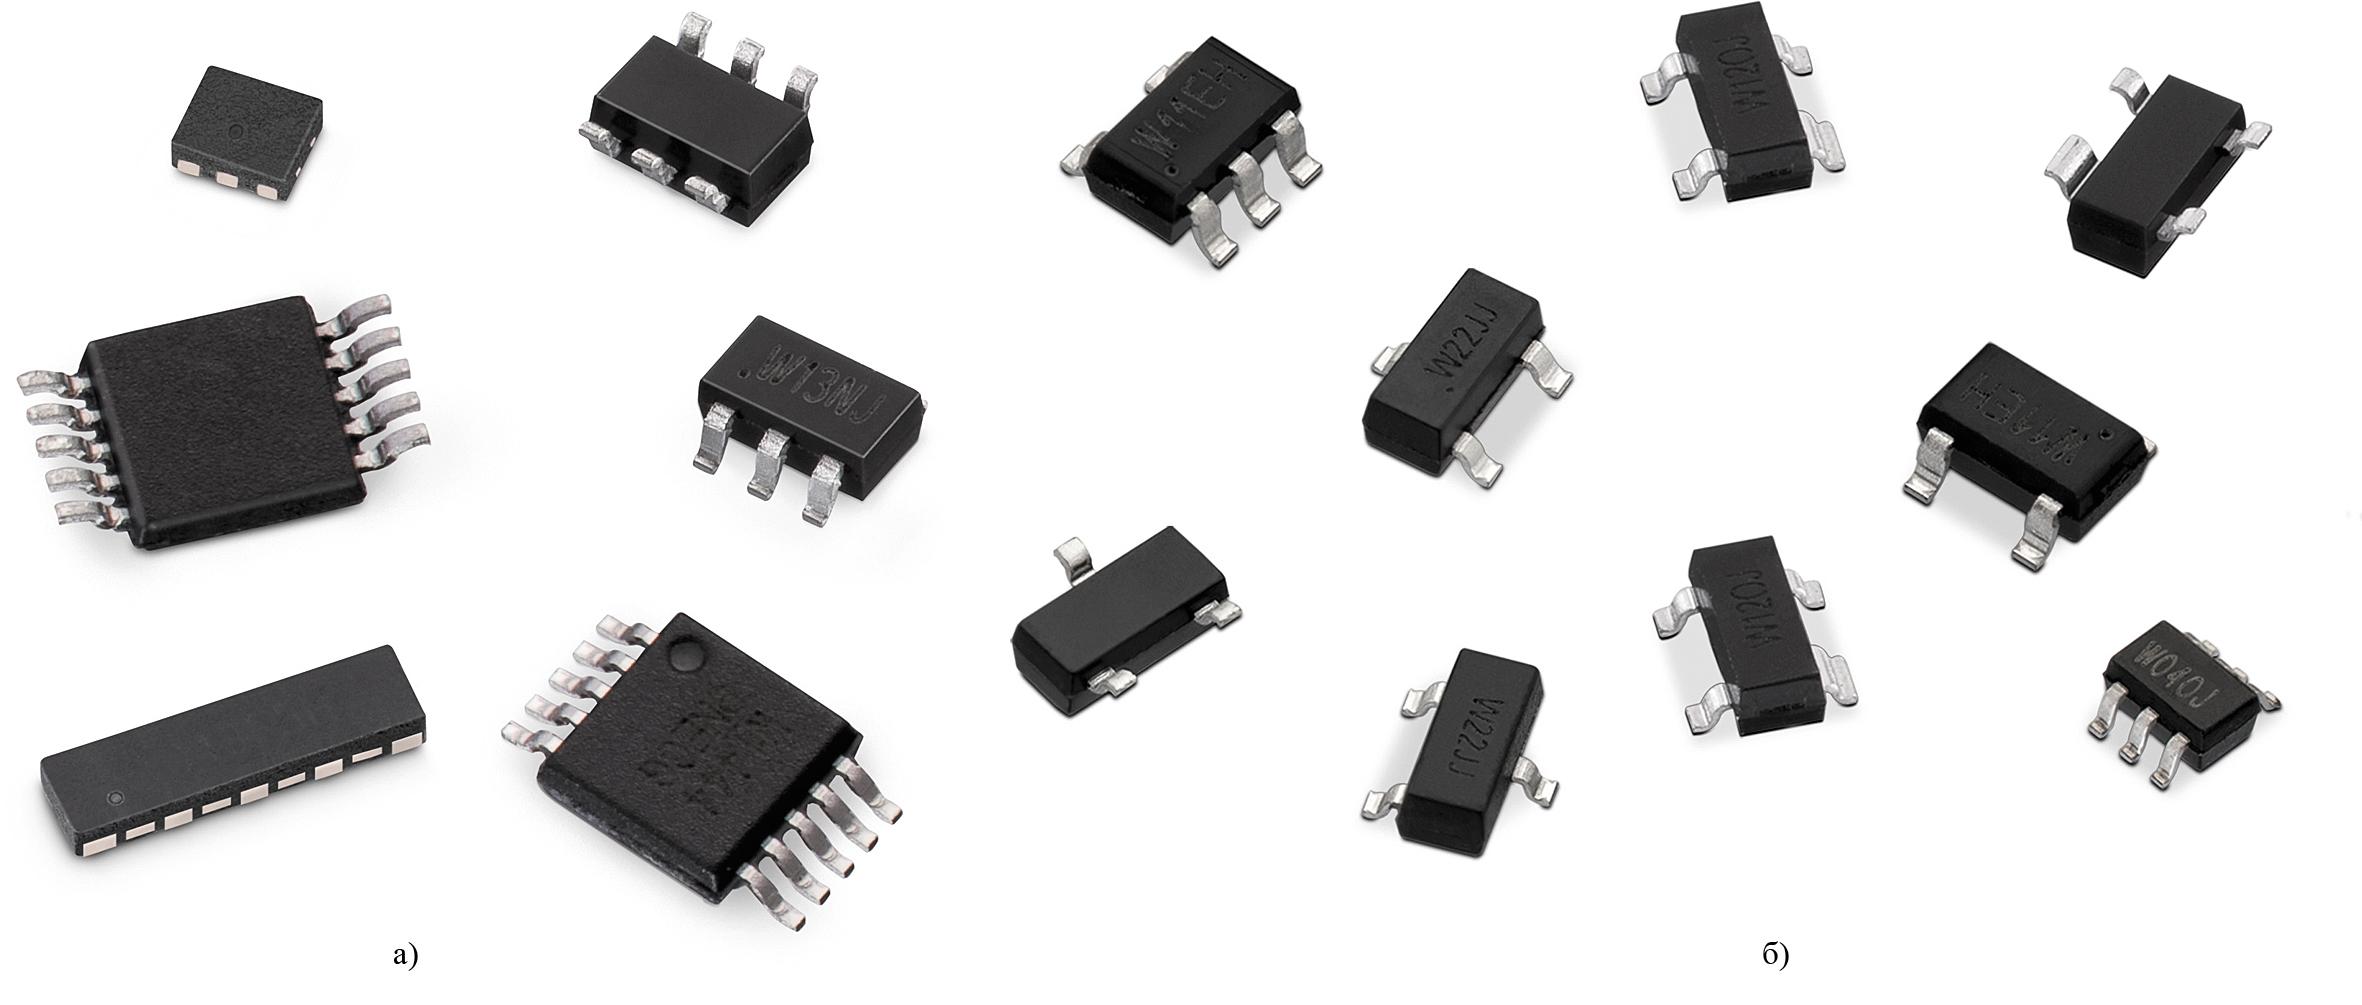 TVS-диоды компании Würth Elektronik